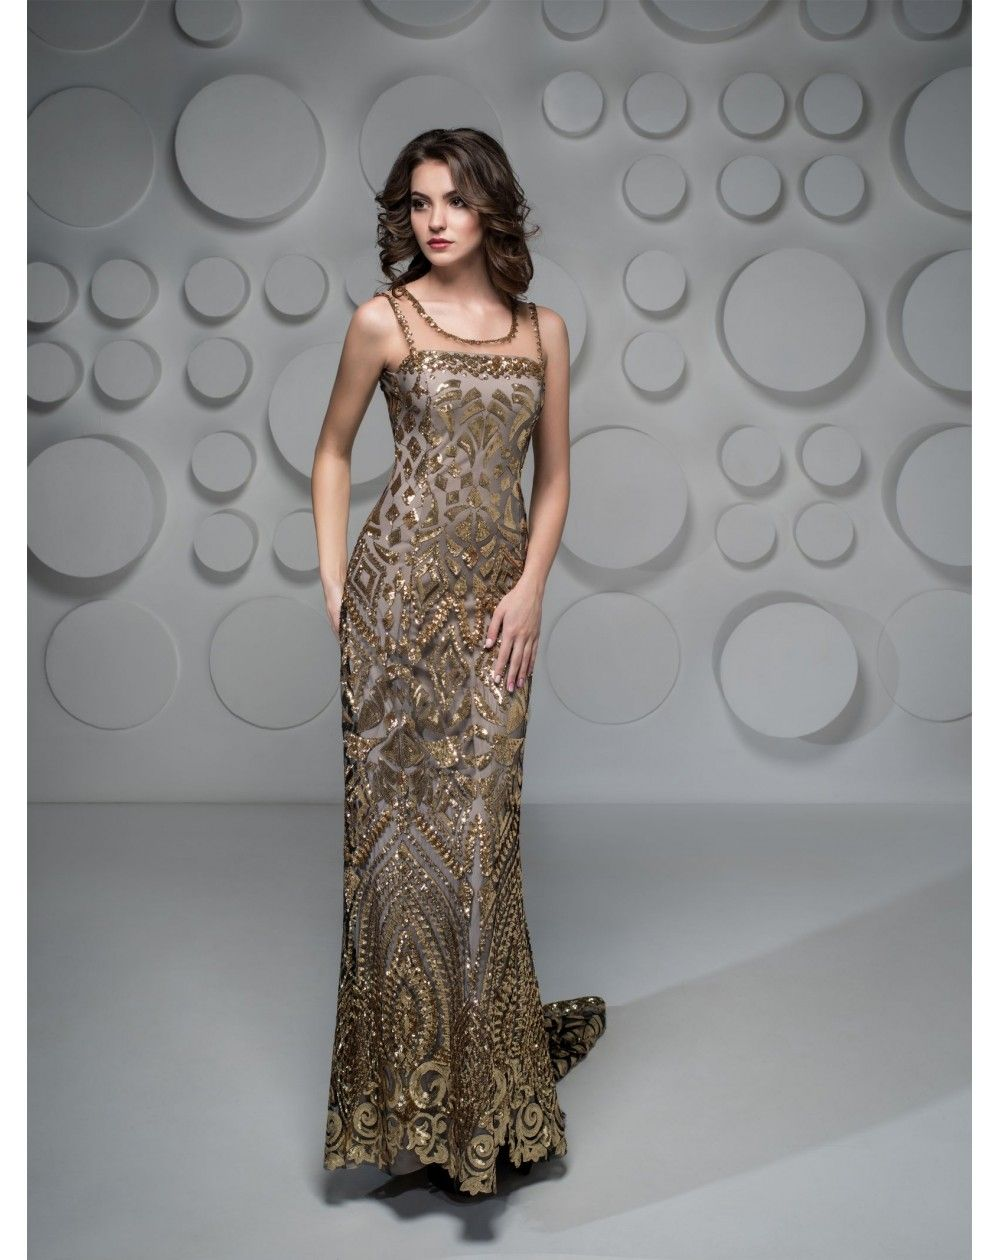 ea1111cd13c3 Luxusné spoločenské šaty MARGOT